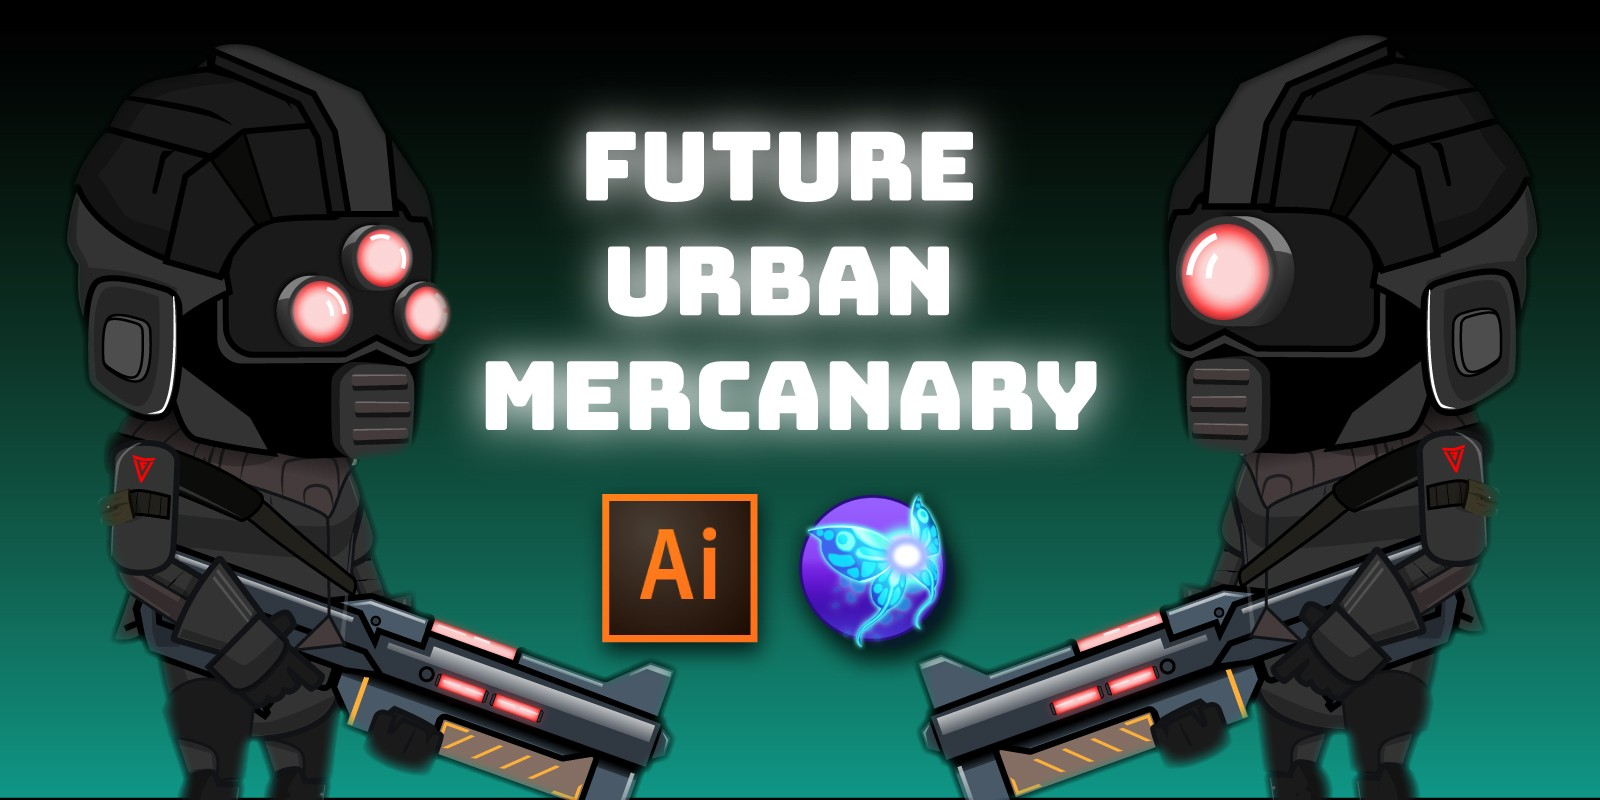 Future Urban Mercenary 2D Character Sprites